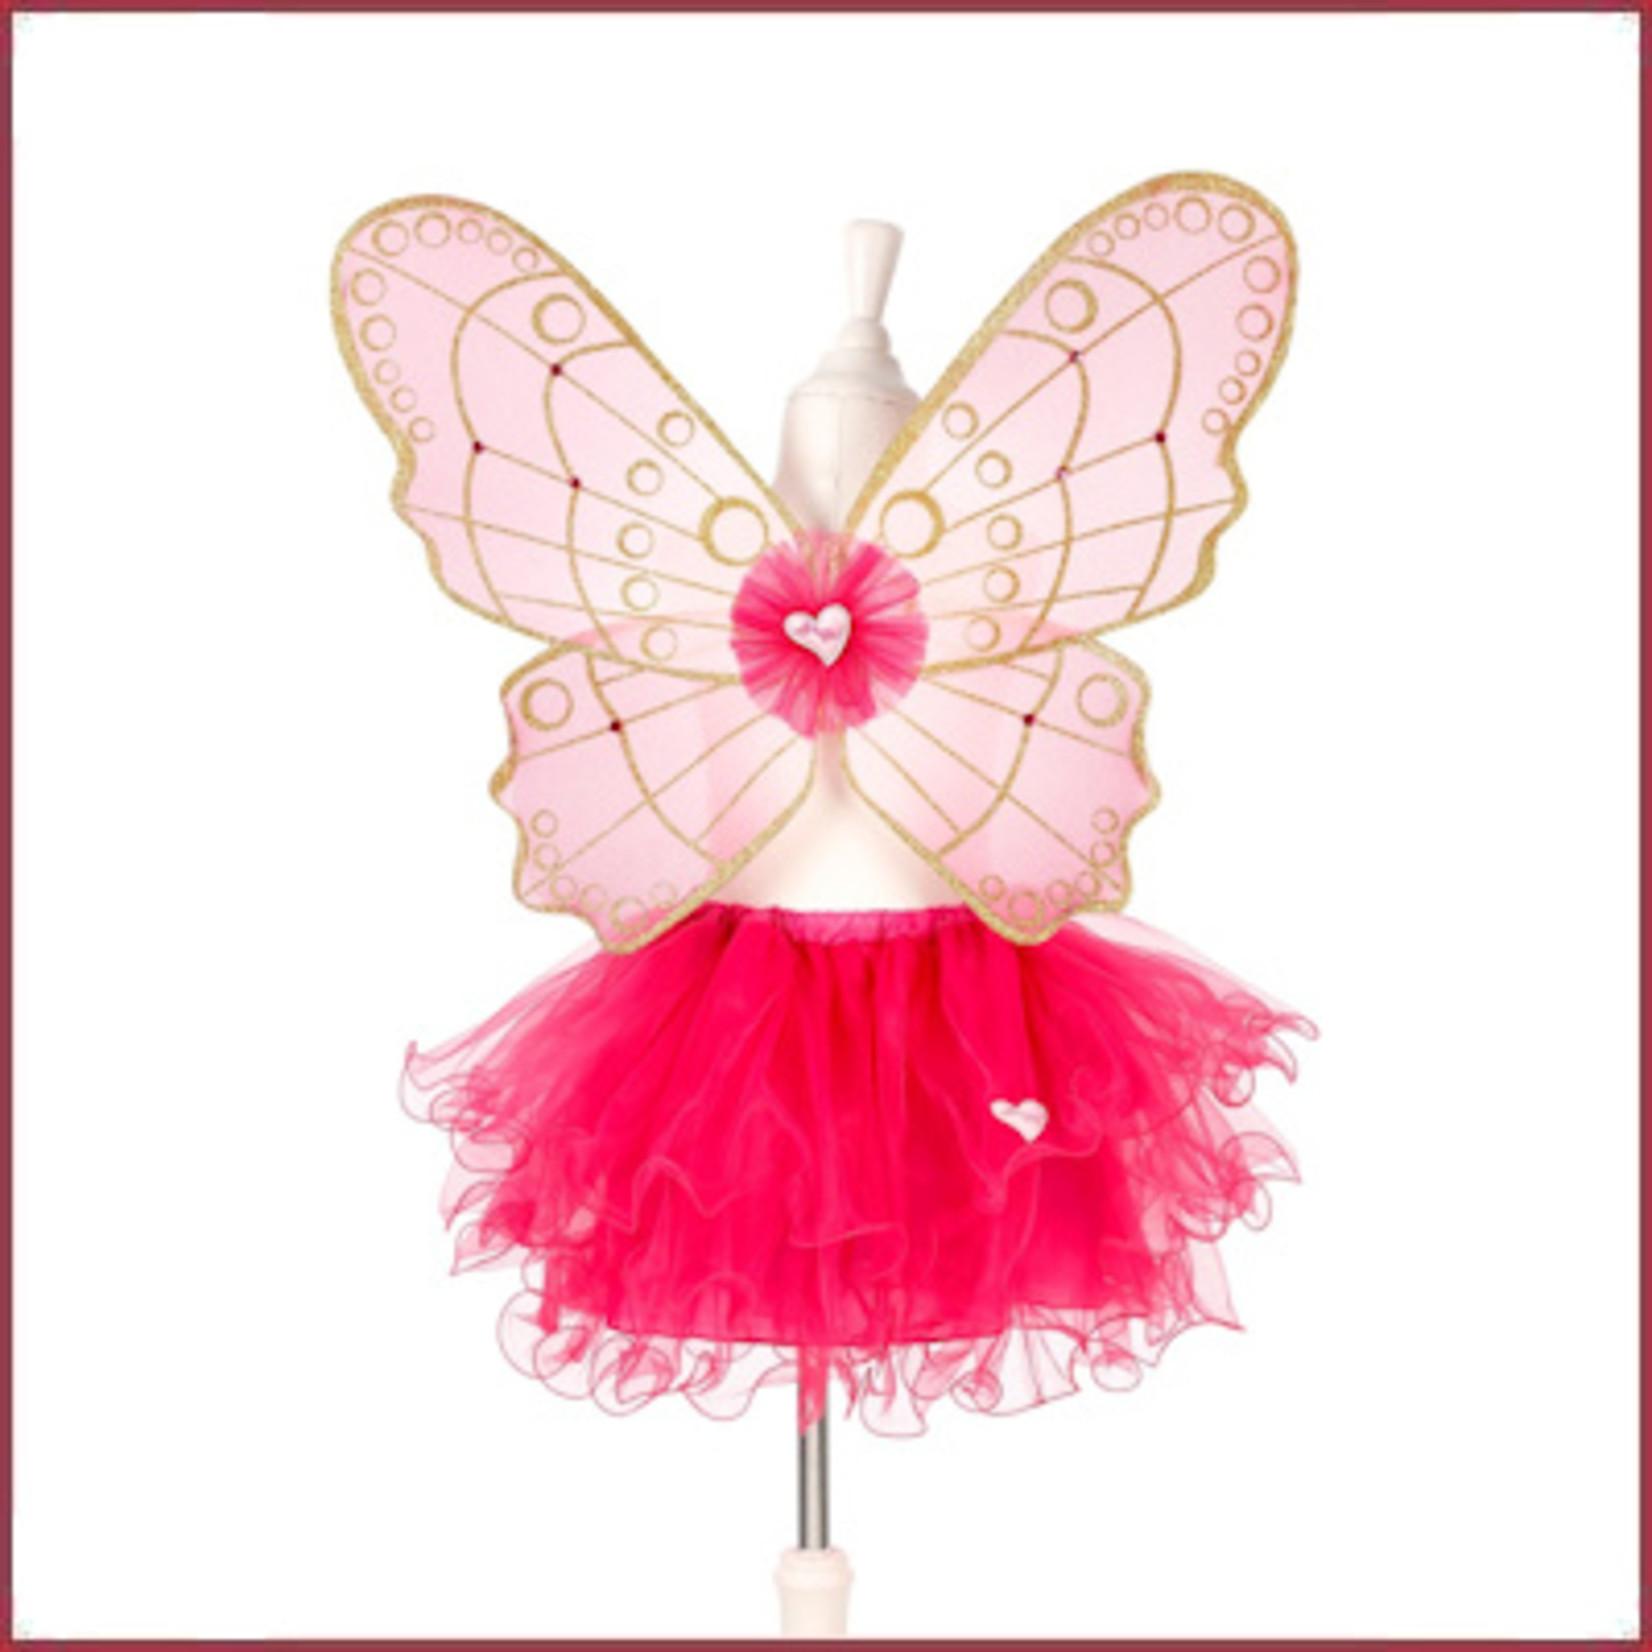 Souza for kids Babette rok + vleugels, fuchsia, verstelbaar